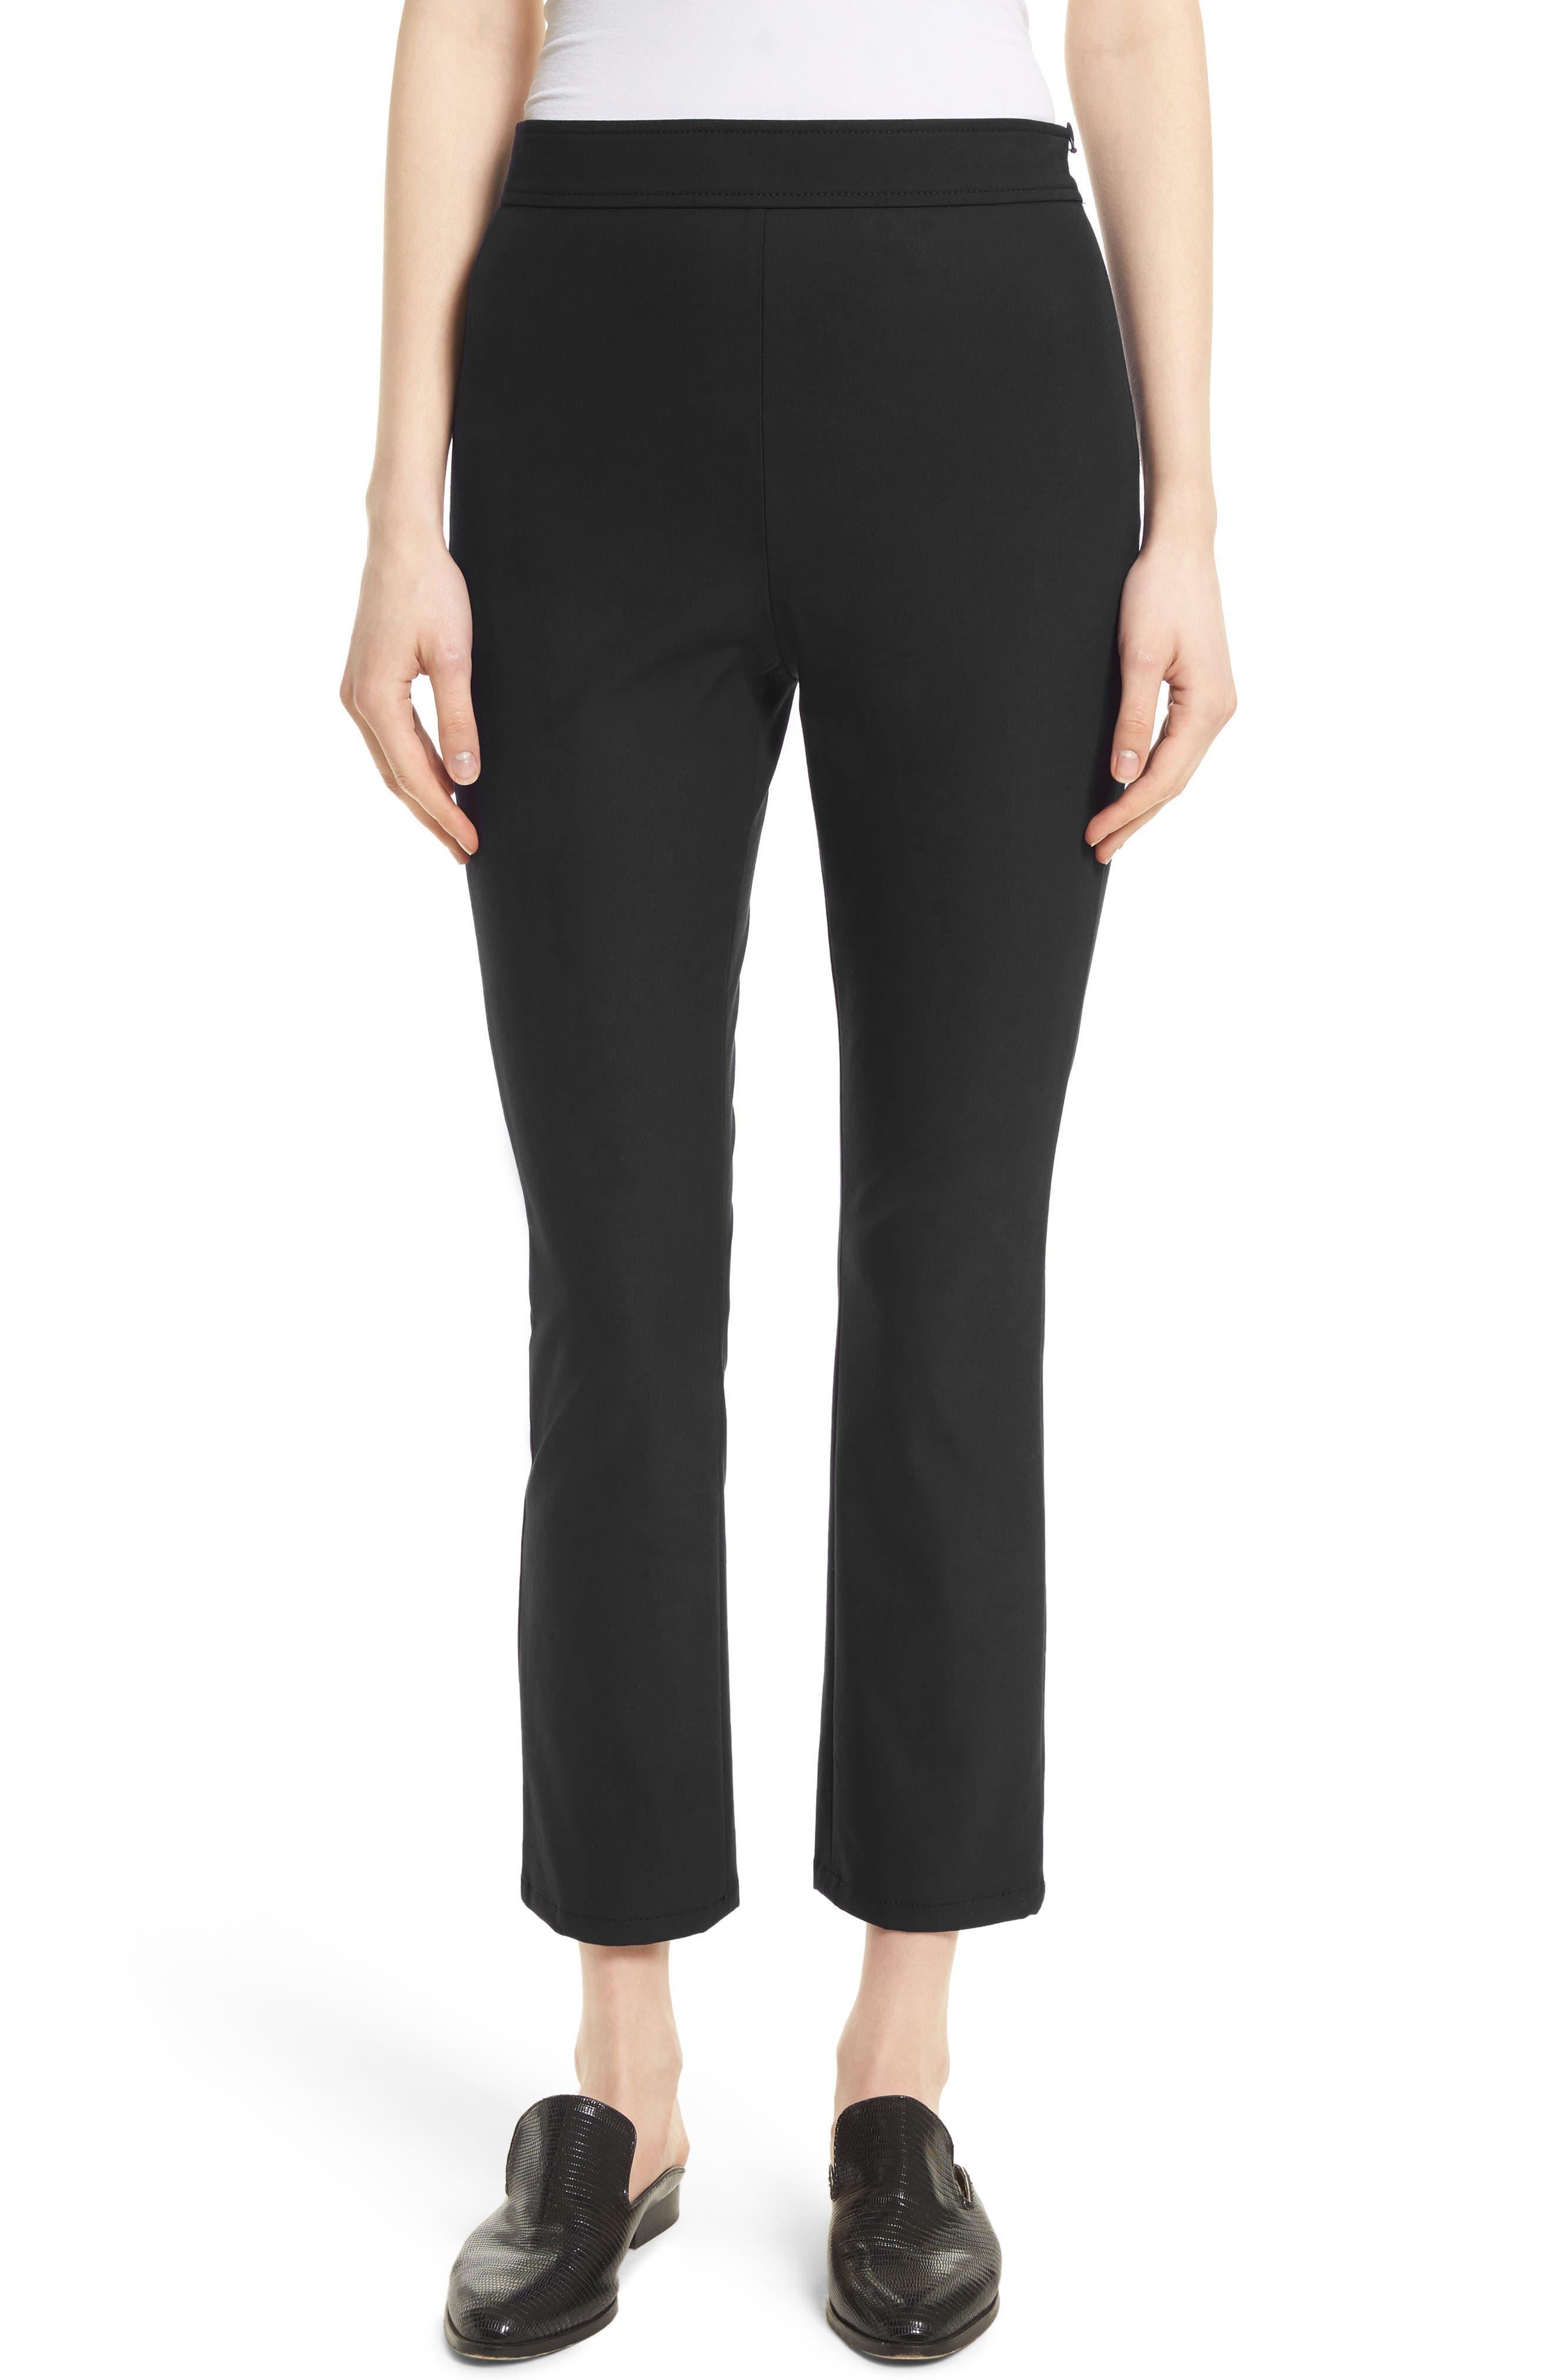 Bimsa Approach Pants,                         Main,                         color, 001